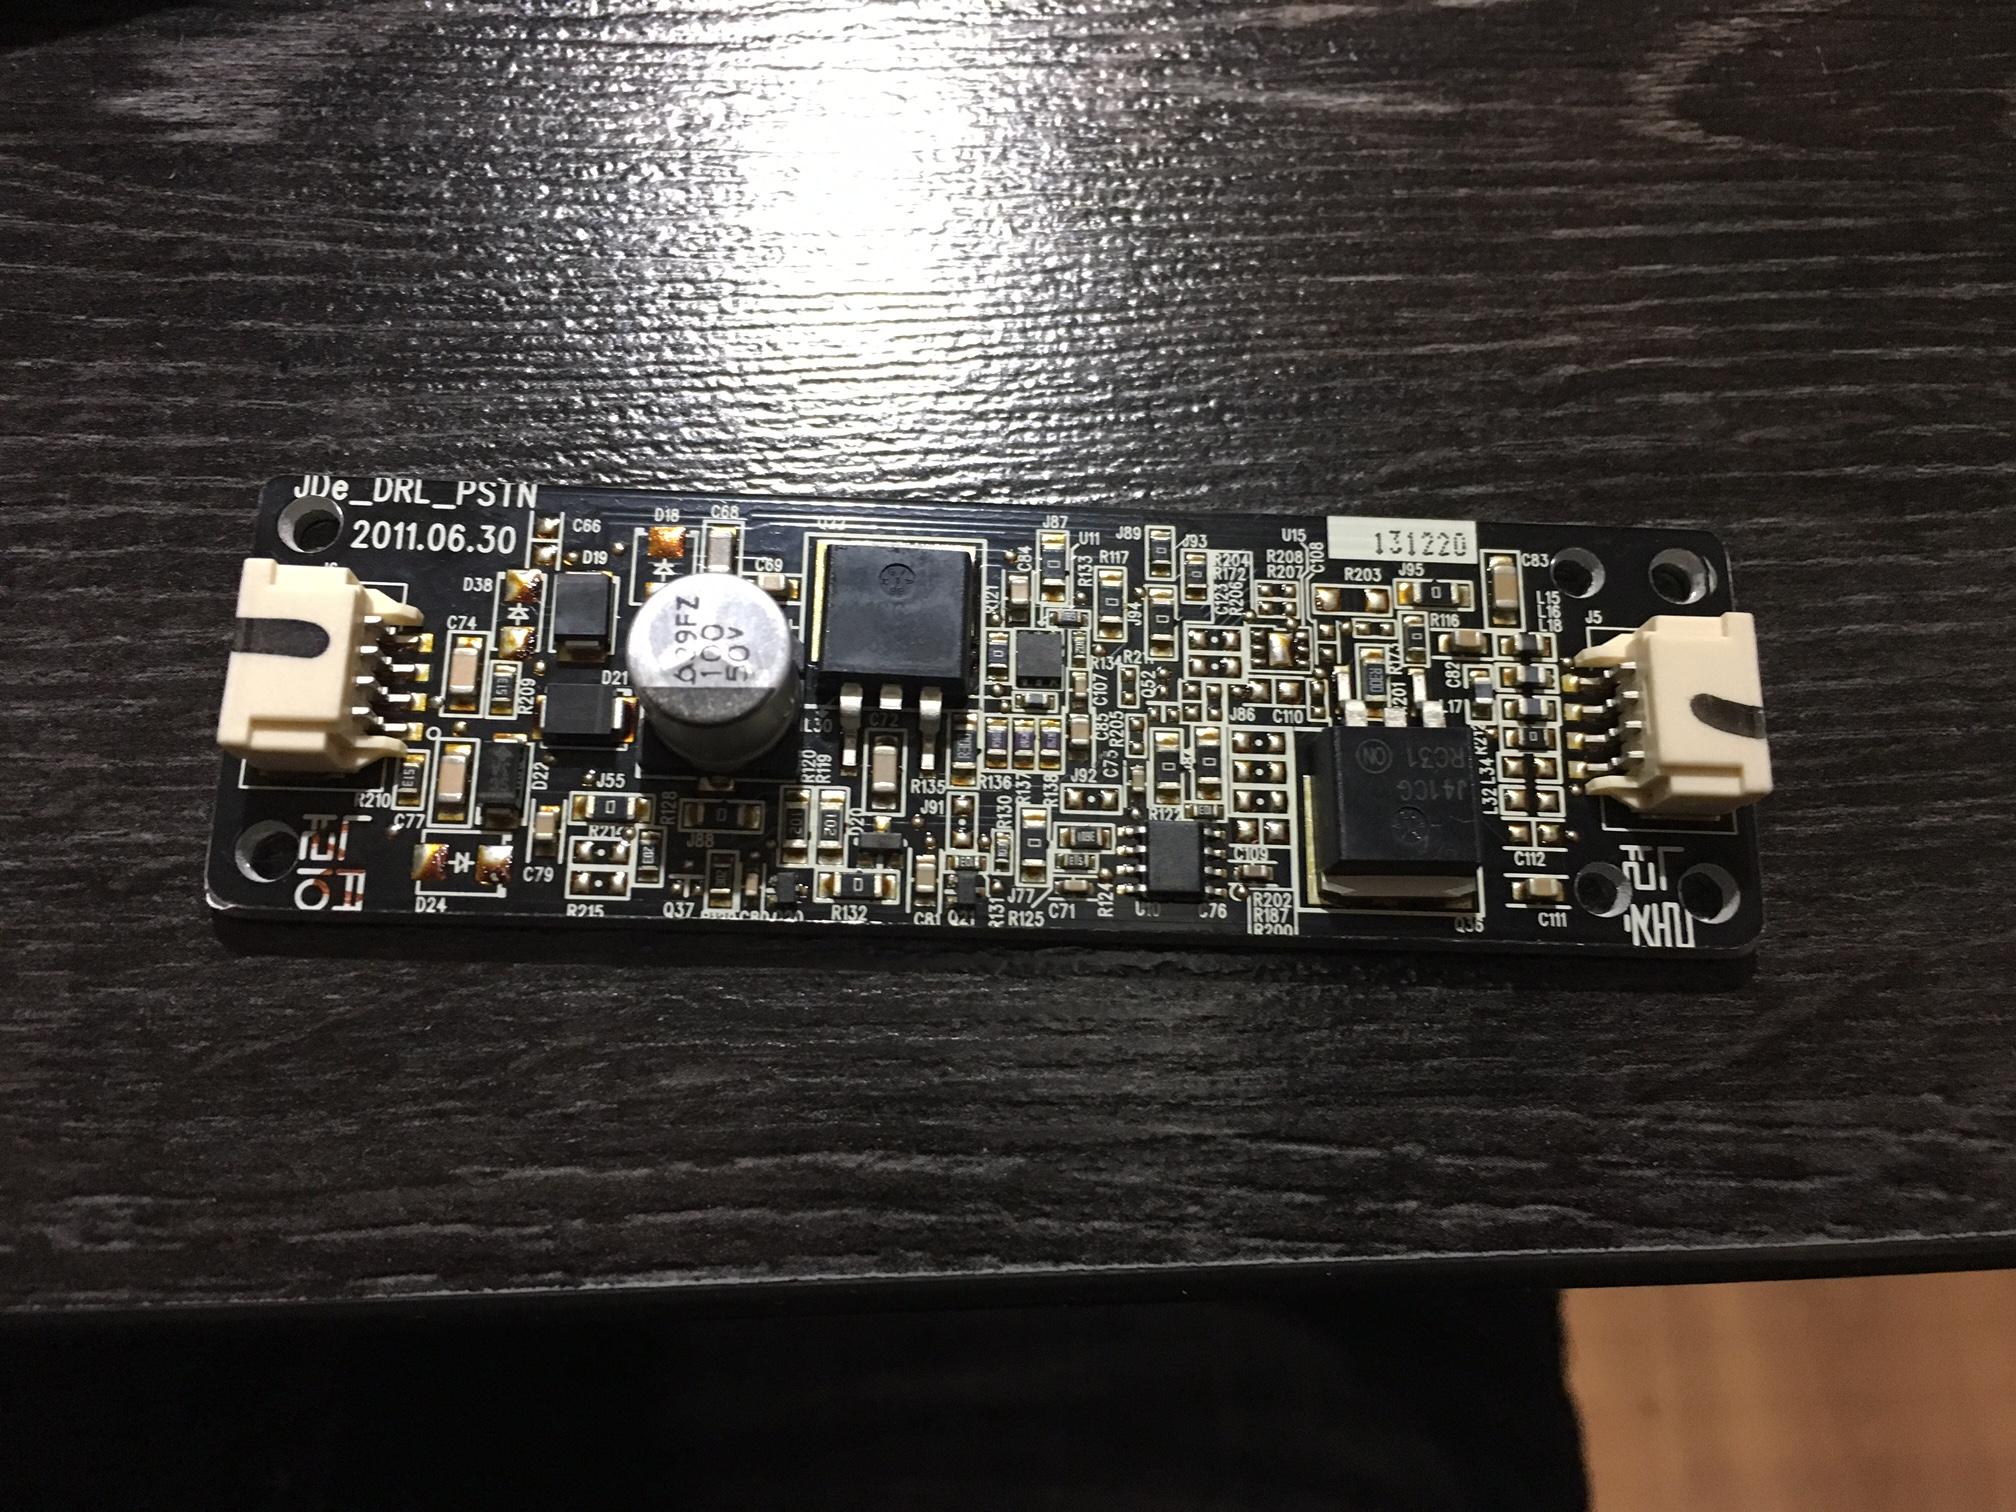 Kia Ceed Led Does Not Work Burnt Inverter